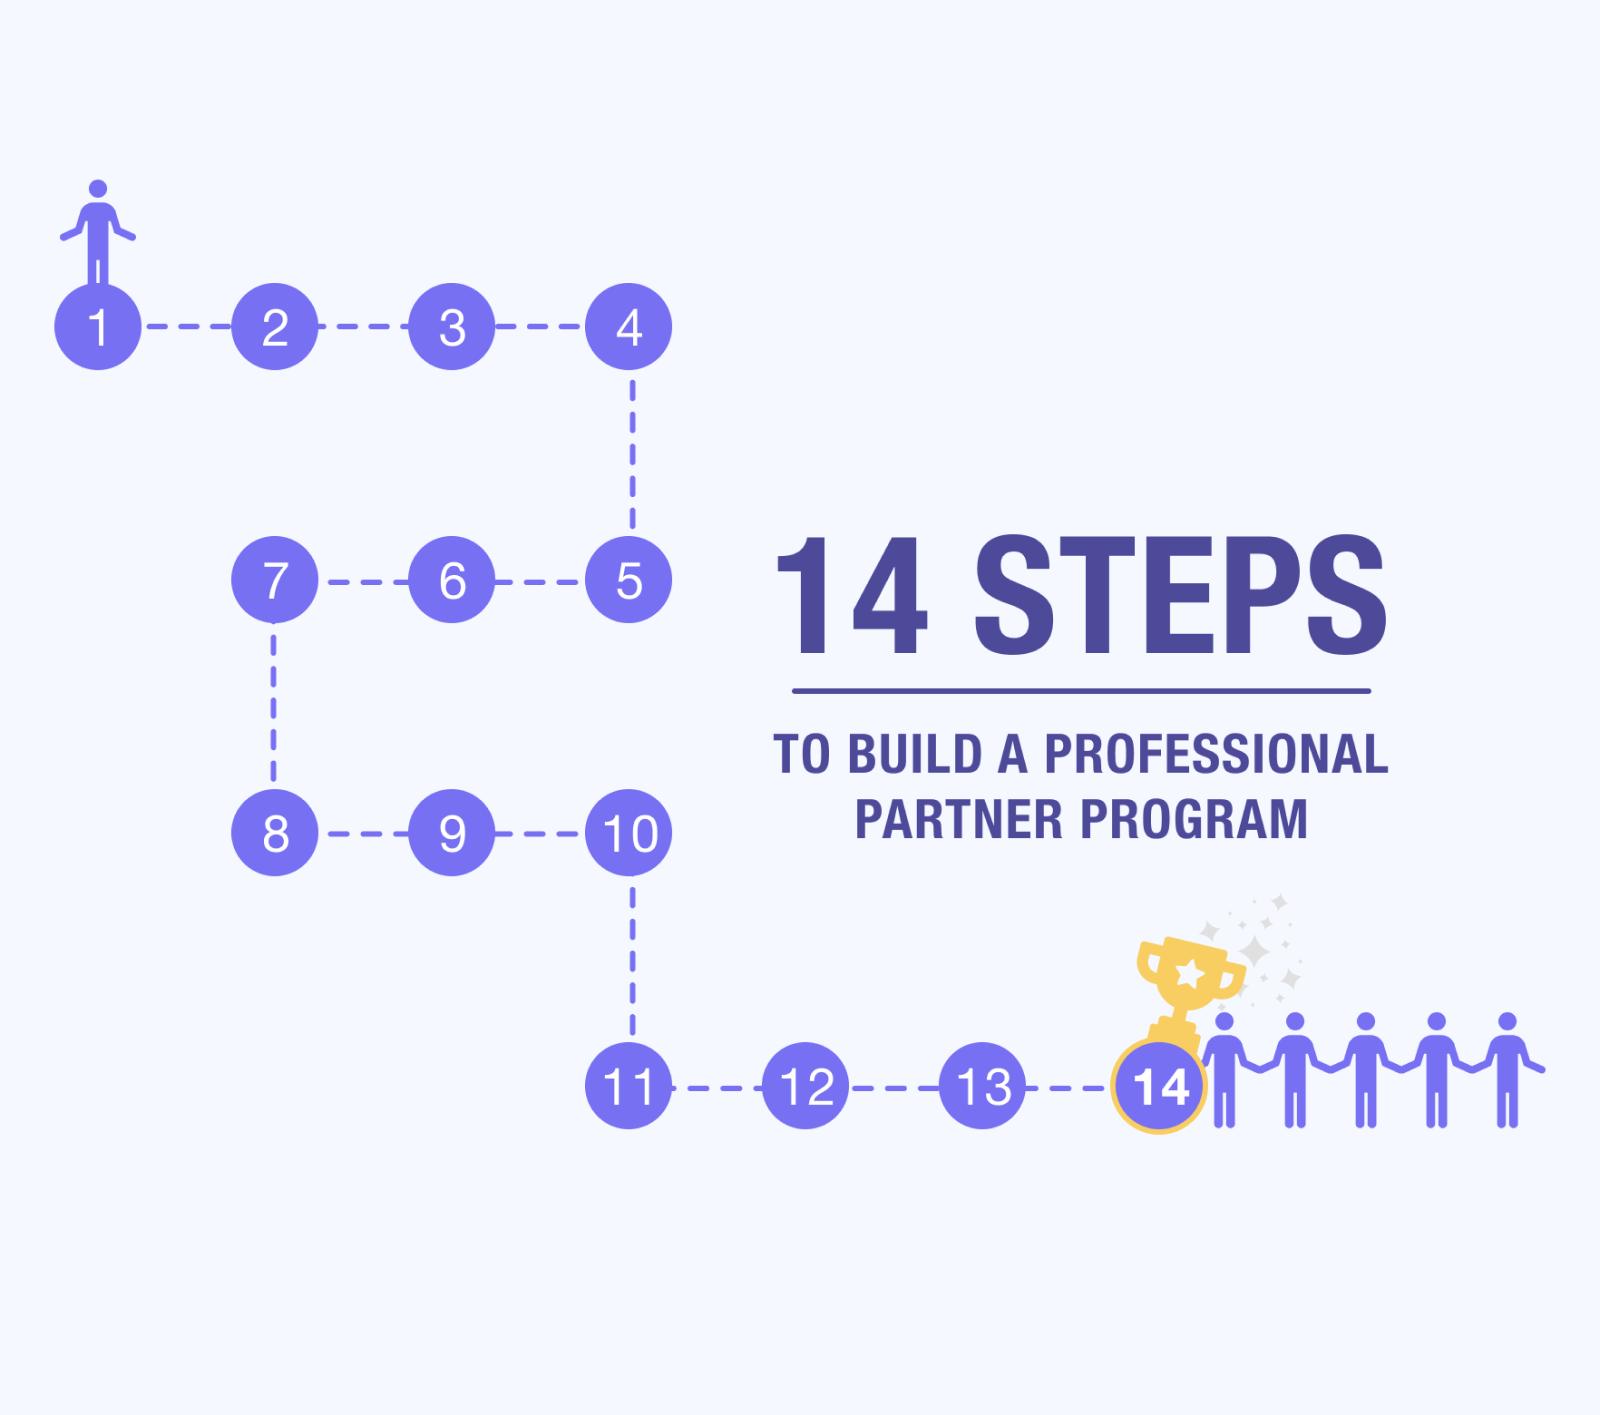 Partner Program – The 14 Steps to Build Your Reseller Channel Program